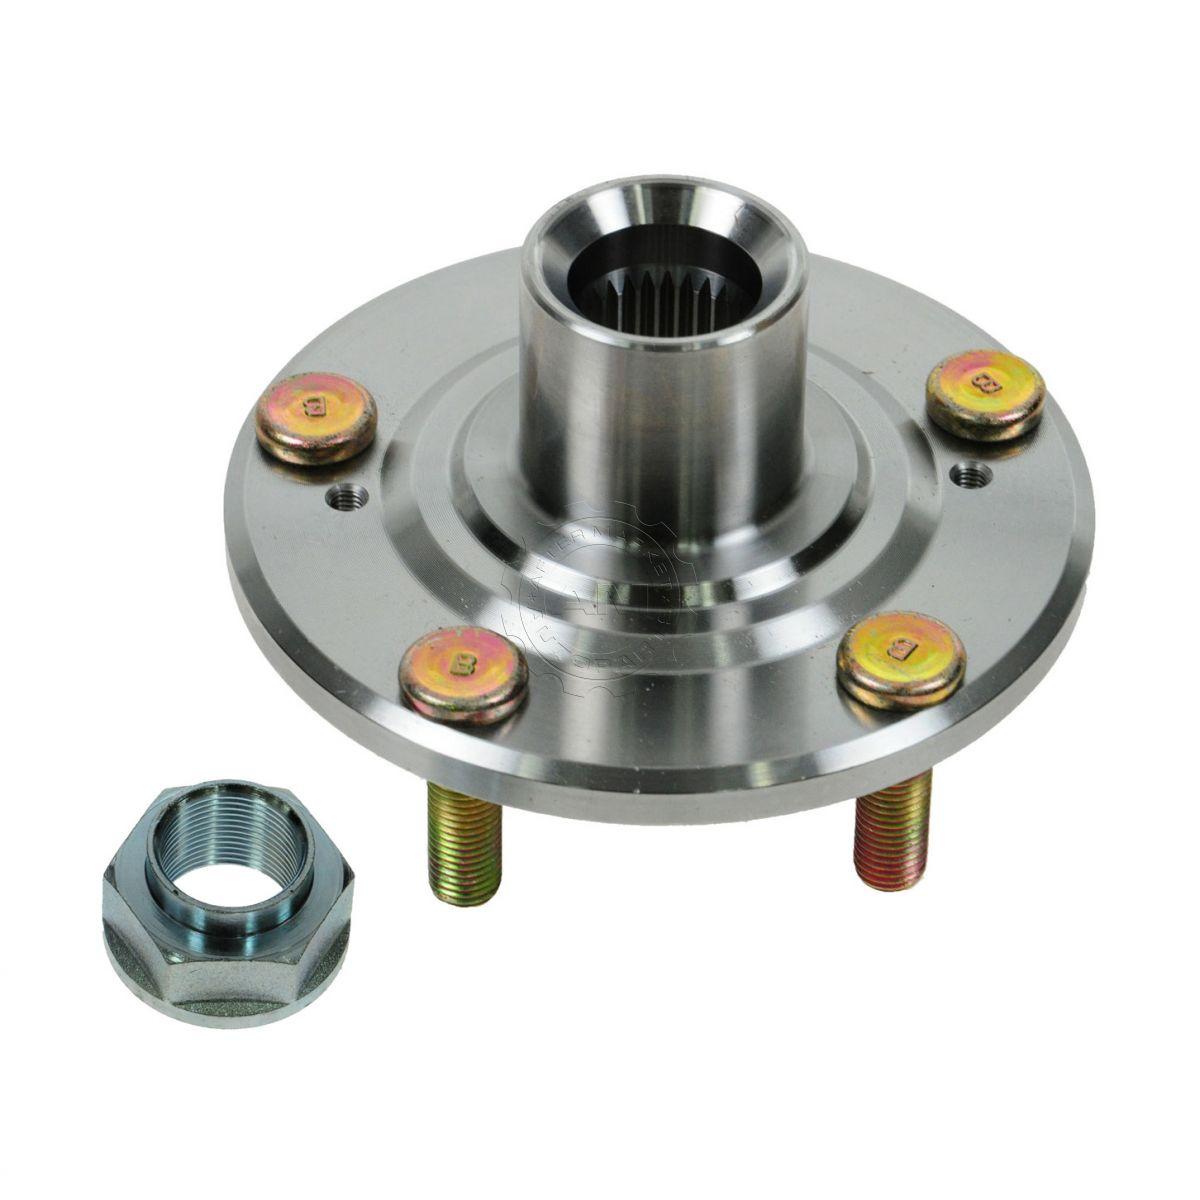 5 Lug Rear Wheel Hub For 01-02 Acura MDX 03-08 Honda Pilot